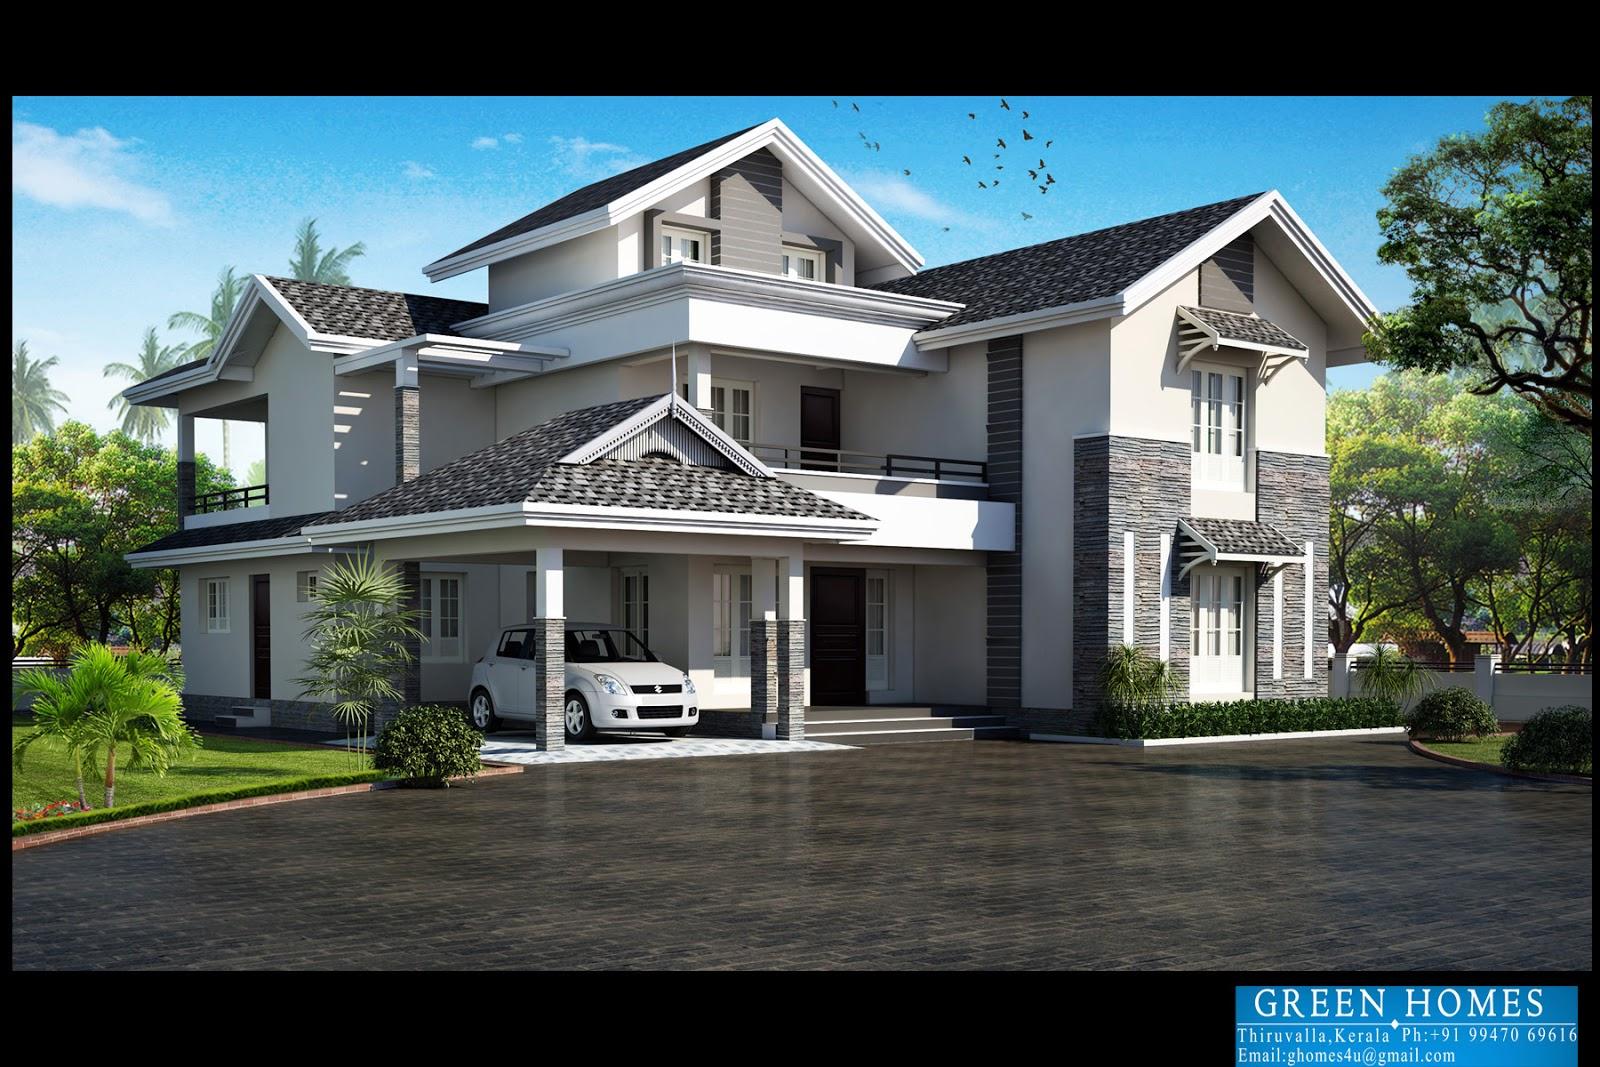 Green Homes Modern Slopping Roof Villa Design